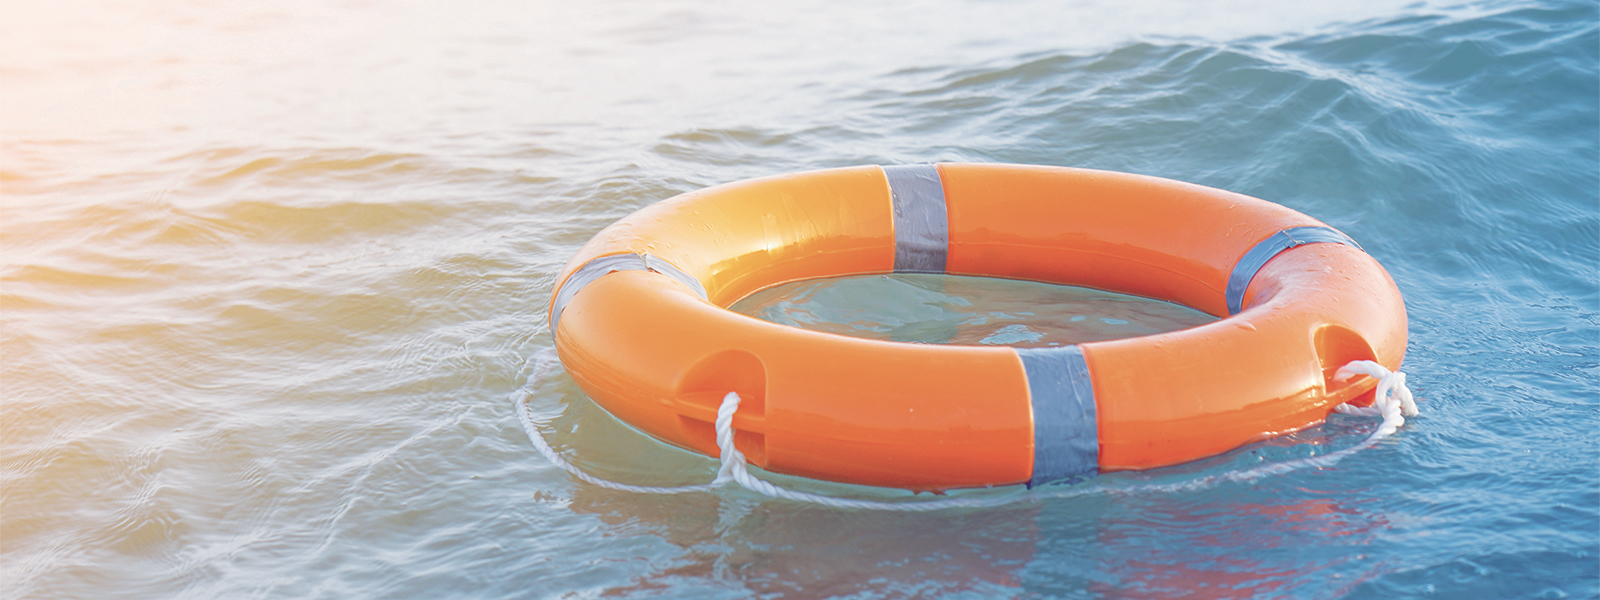 Symboldbild Rettungsring